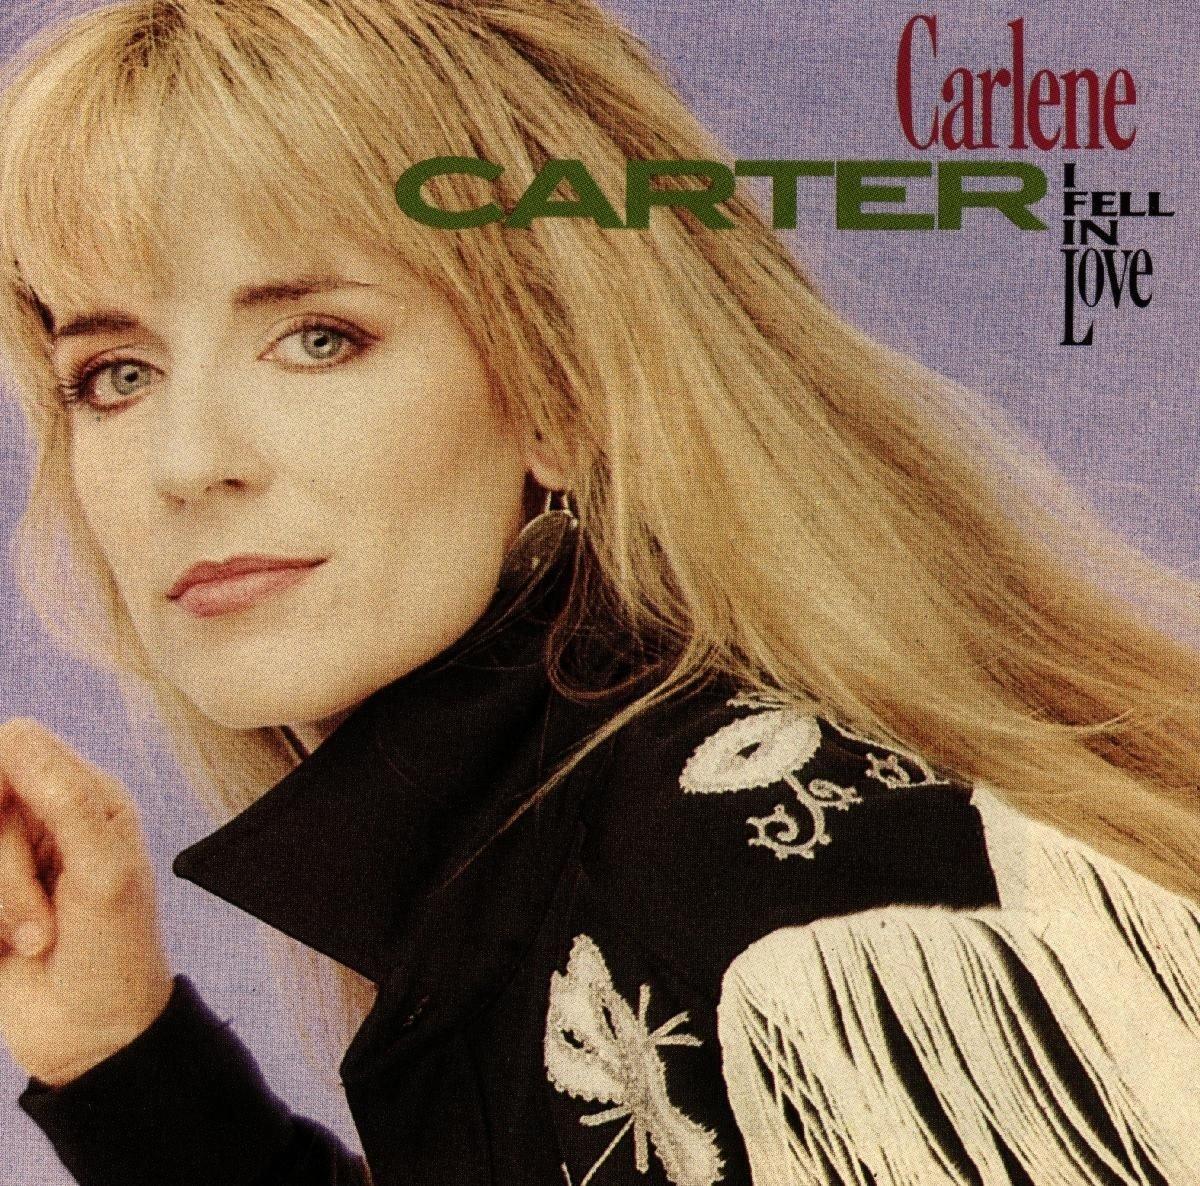 Carlene Carter - I Fell In Love (1990) [FLAC] Download